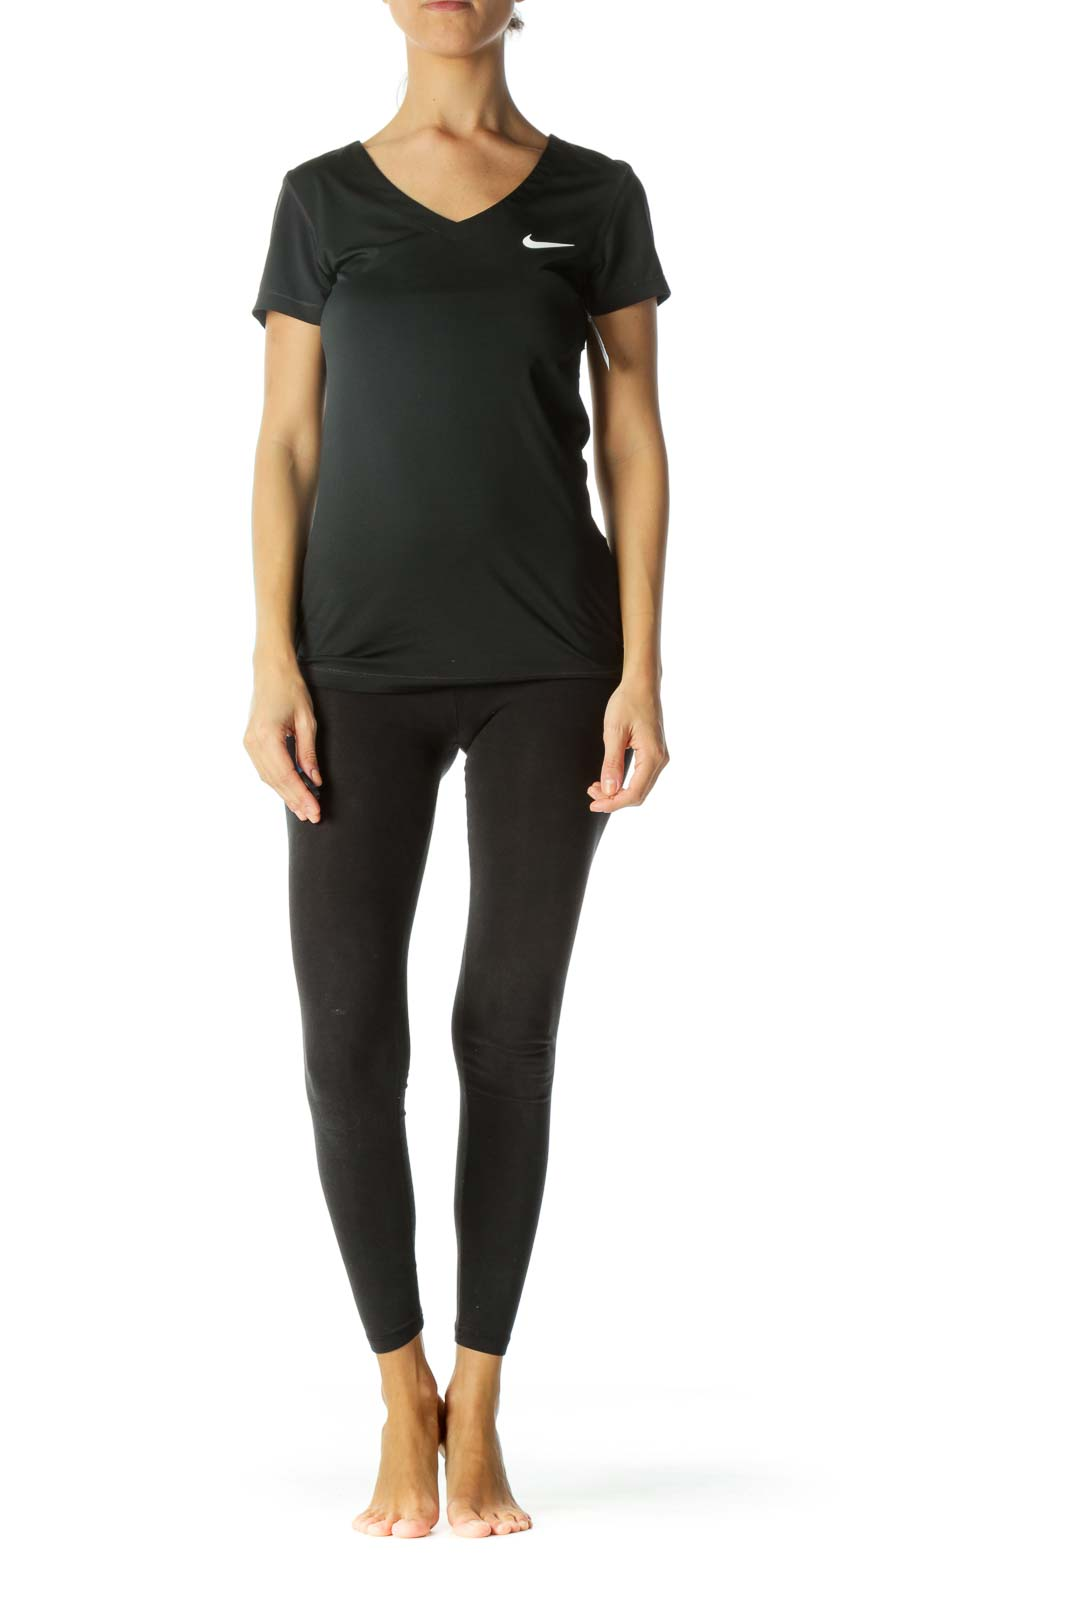 Black V-Neck Short-Sleeve Sports Top with Logo